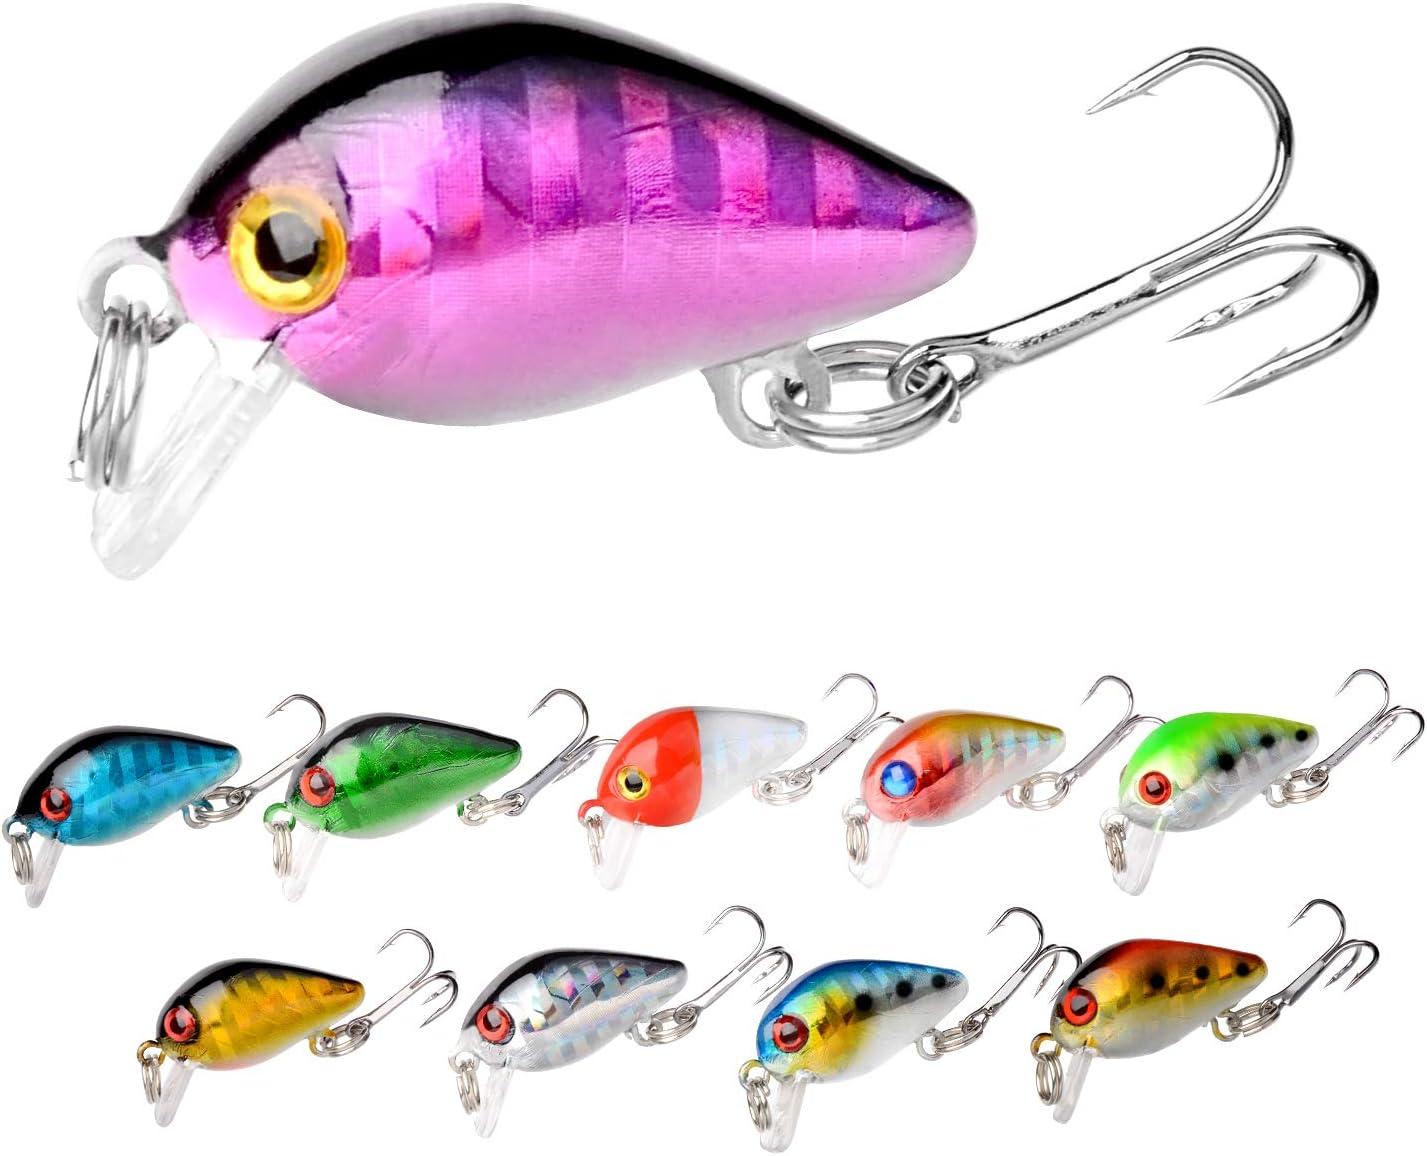 5PCS//10PCS Hard Fishing Lures Fish Crankbaits Bass Minnow Baits Swimbait Tackle